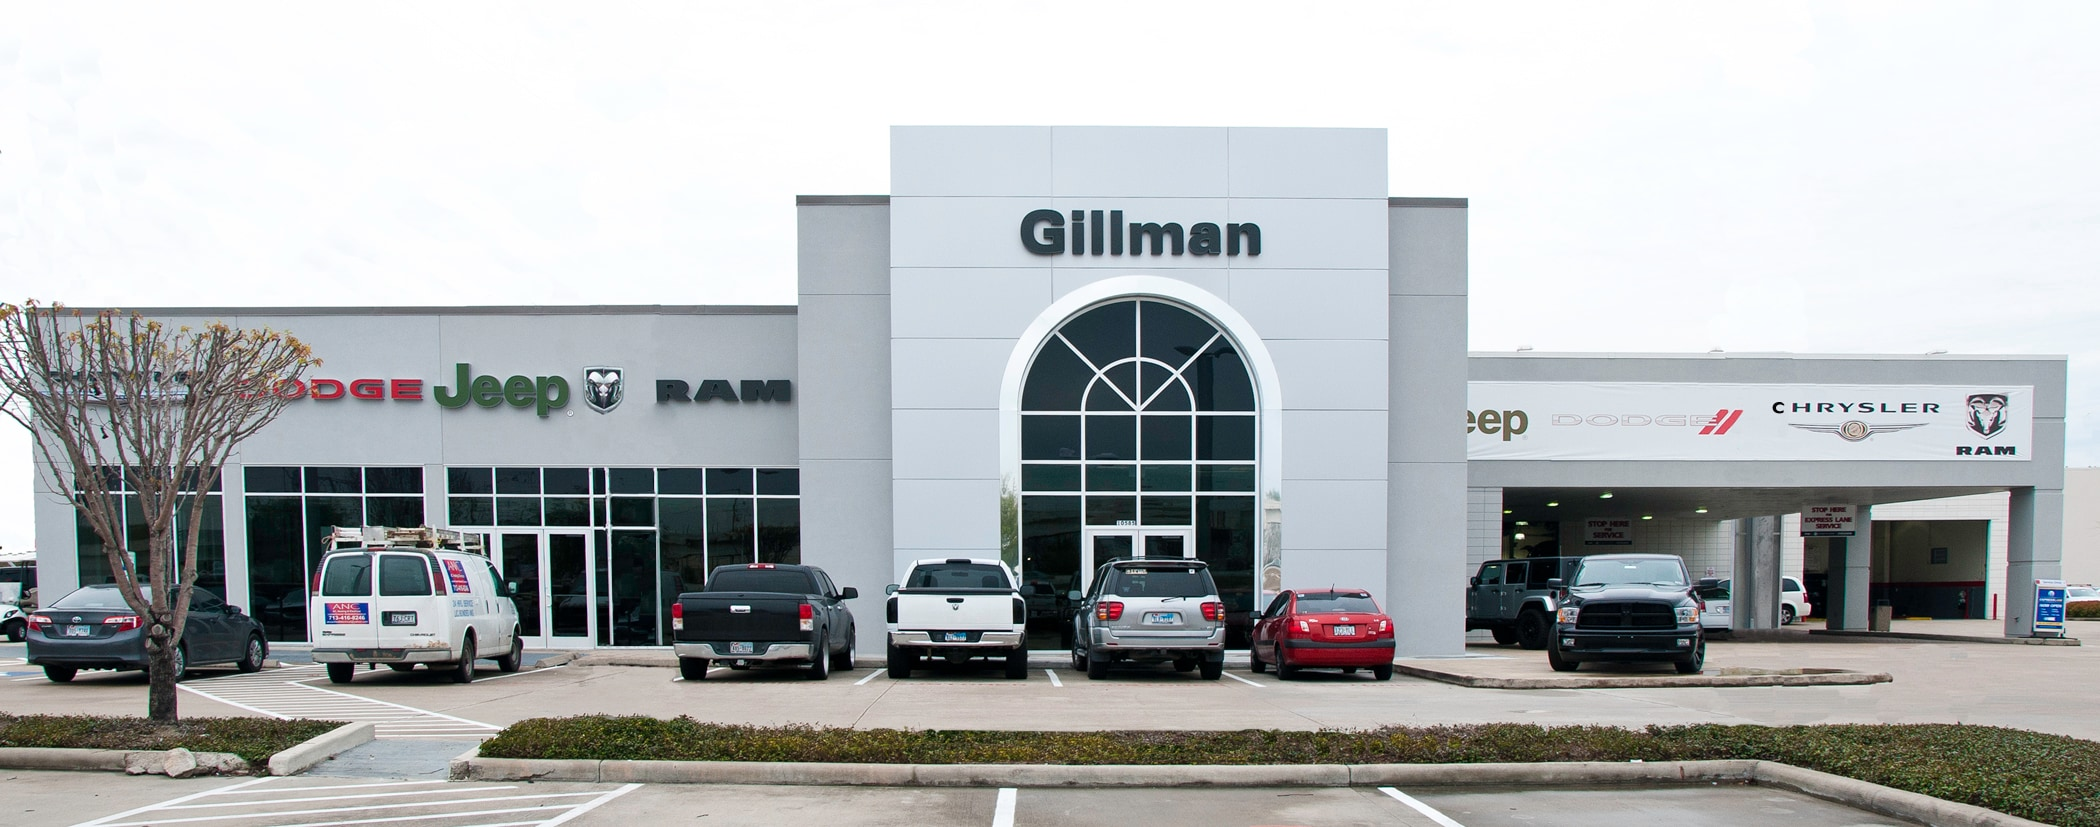 automotive group gillman chrysler jeep dodge ram got a facelift. Cars Review. Best American Auto & Cars Review